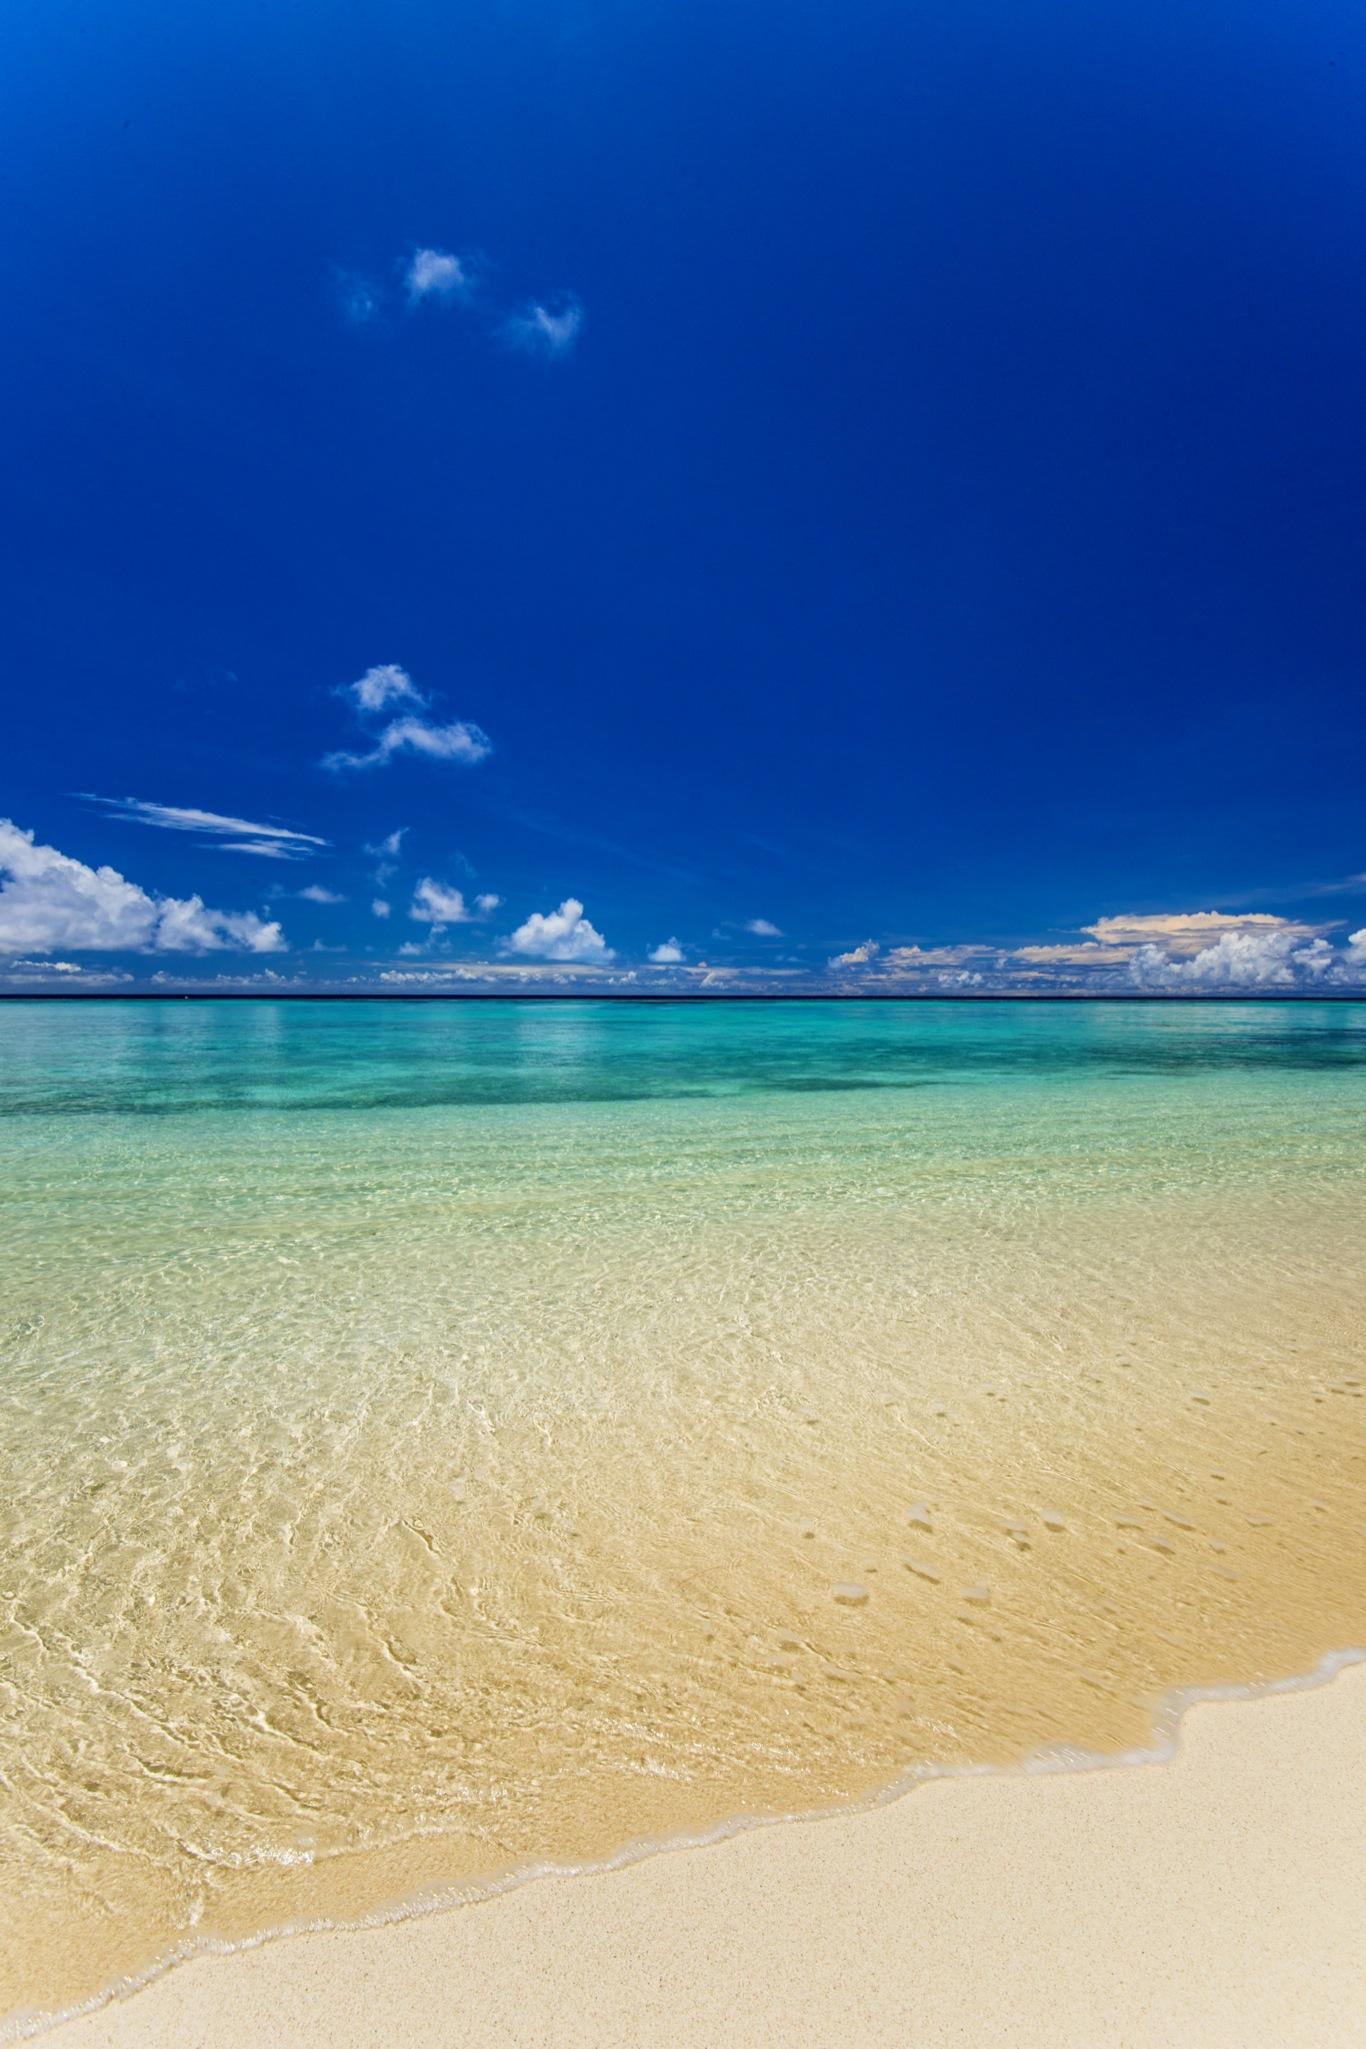 Calm Ocean Panasesa Isalnd